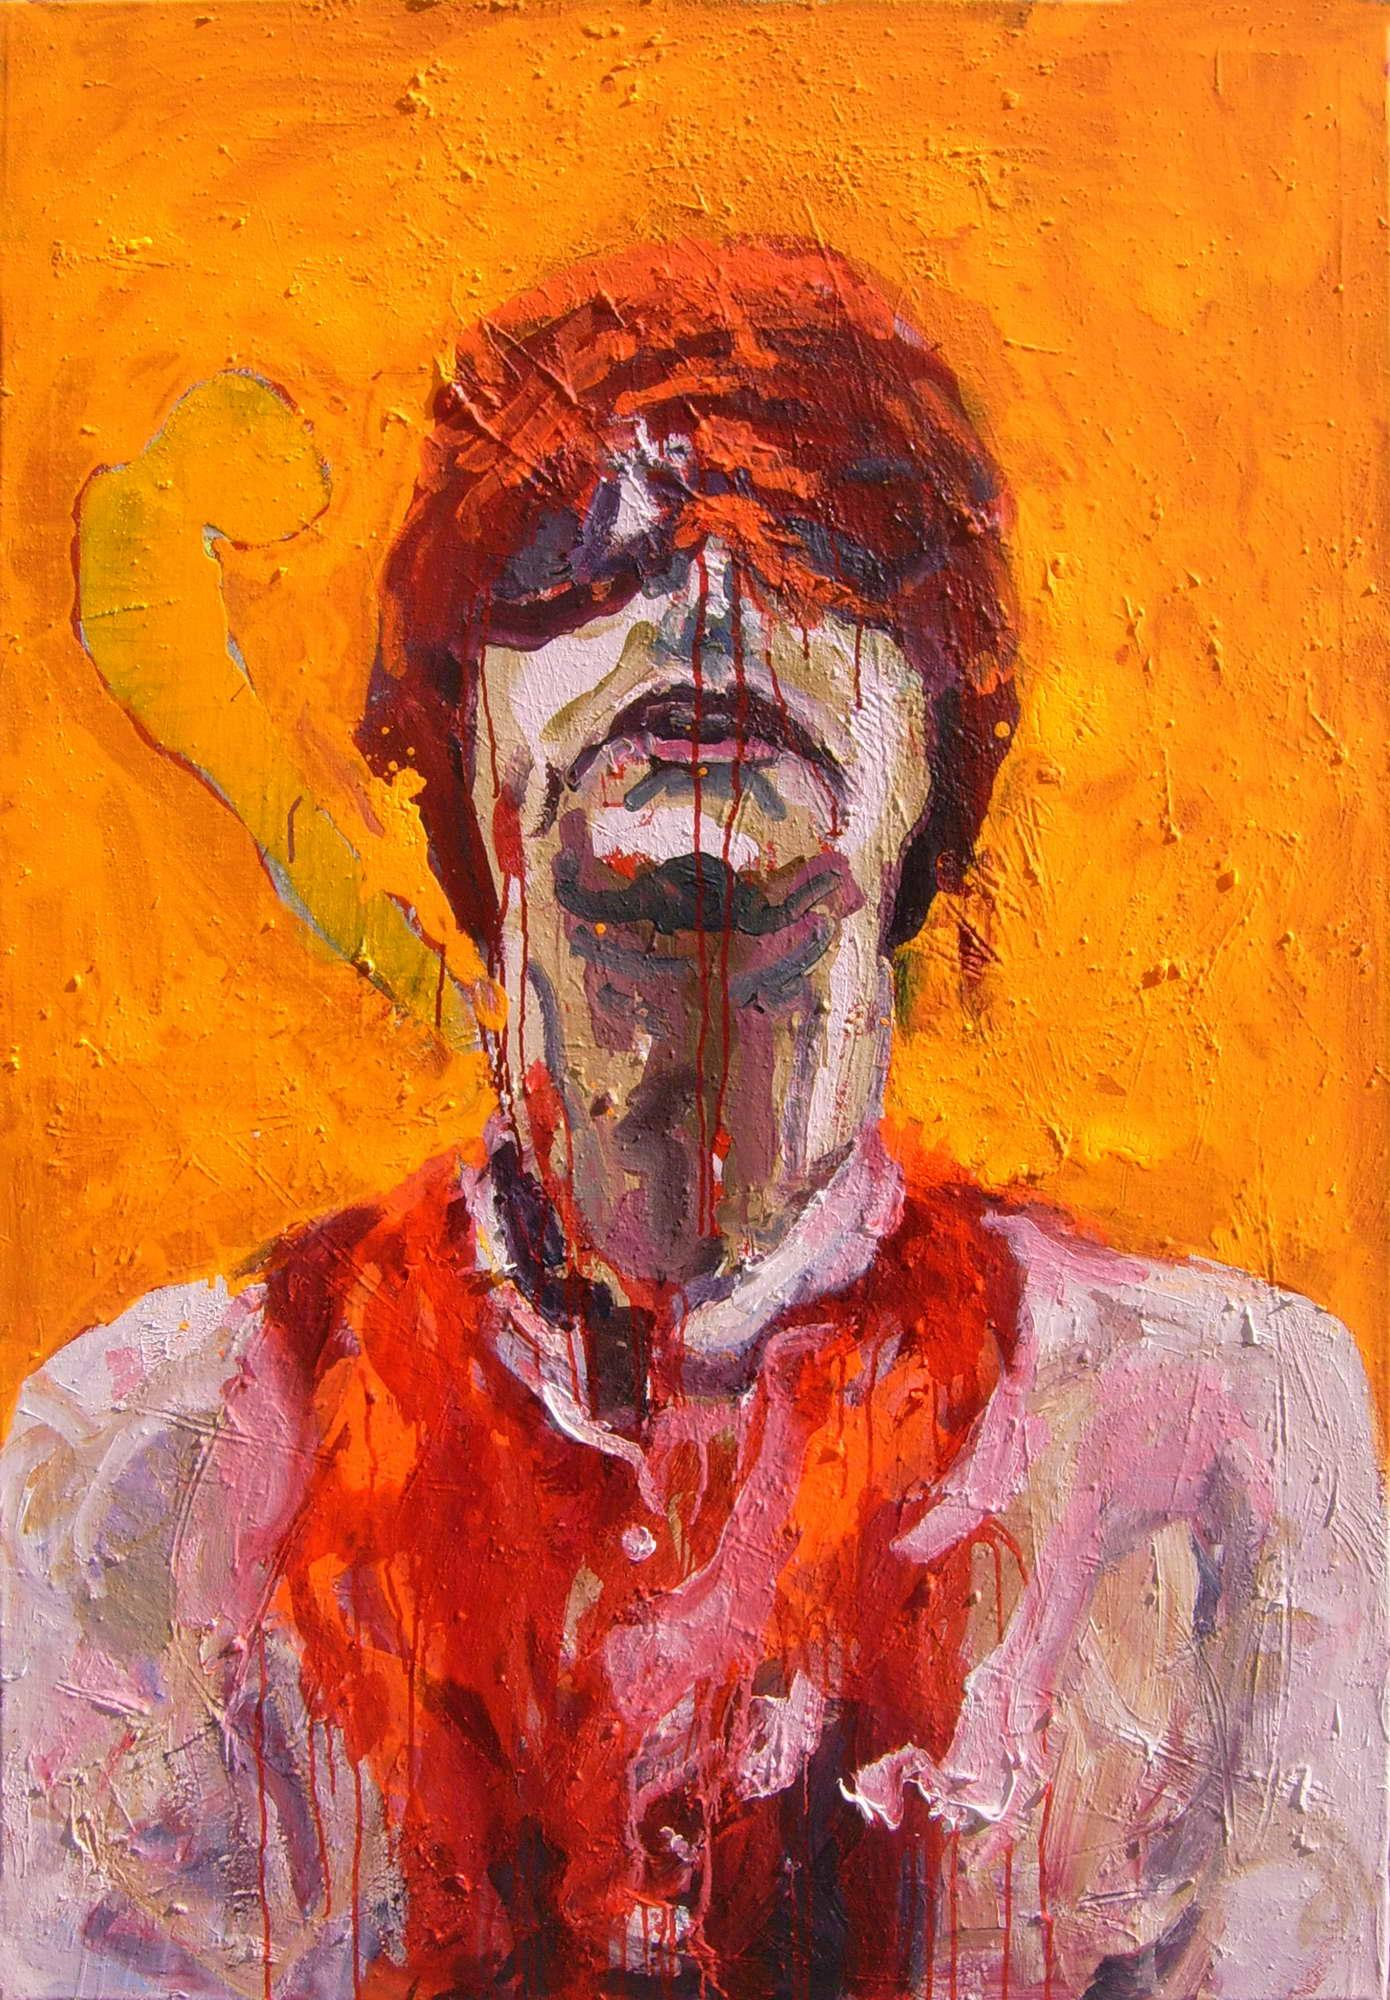 Tribute to Helnwein